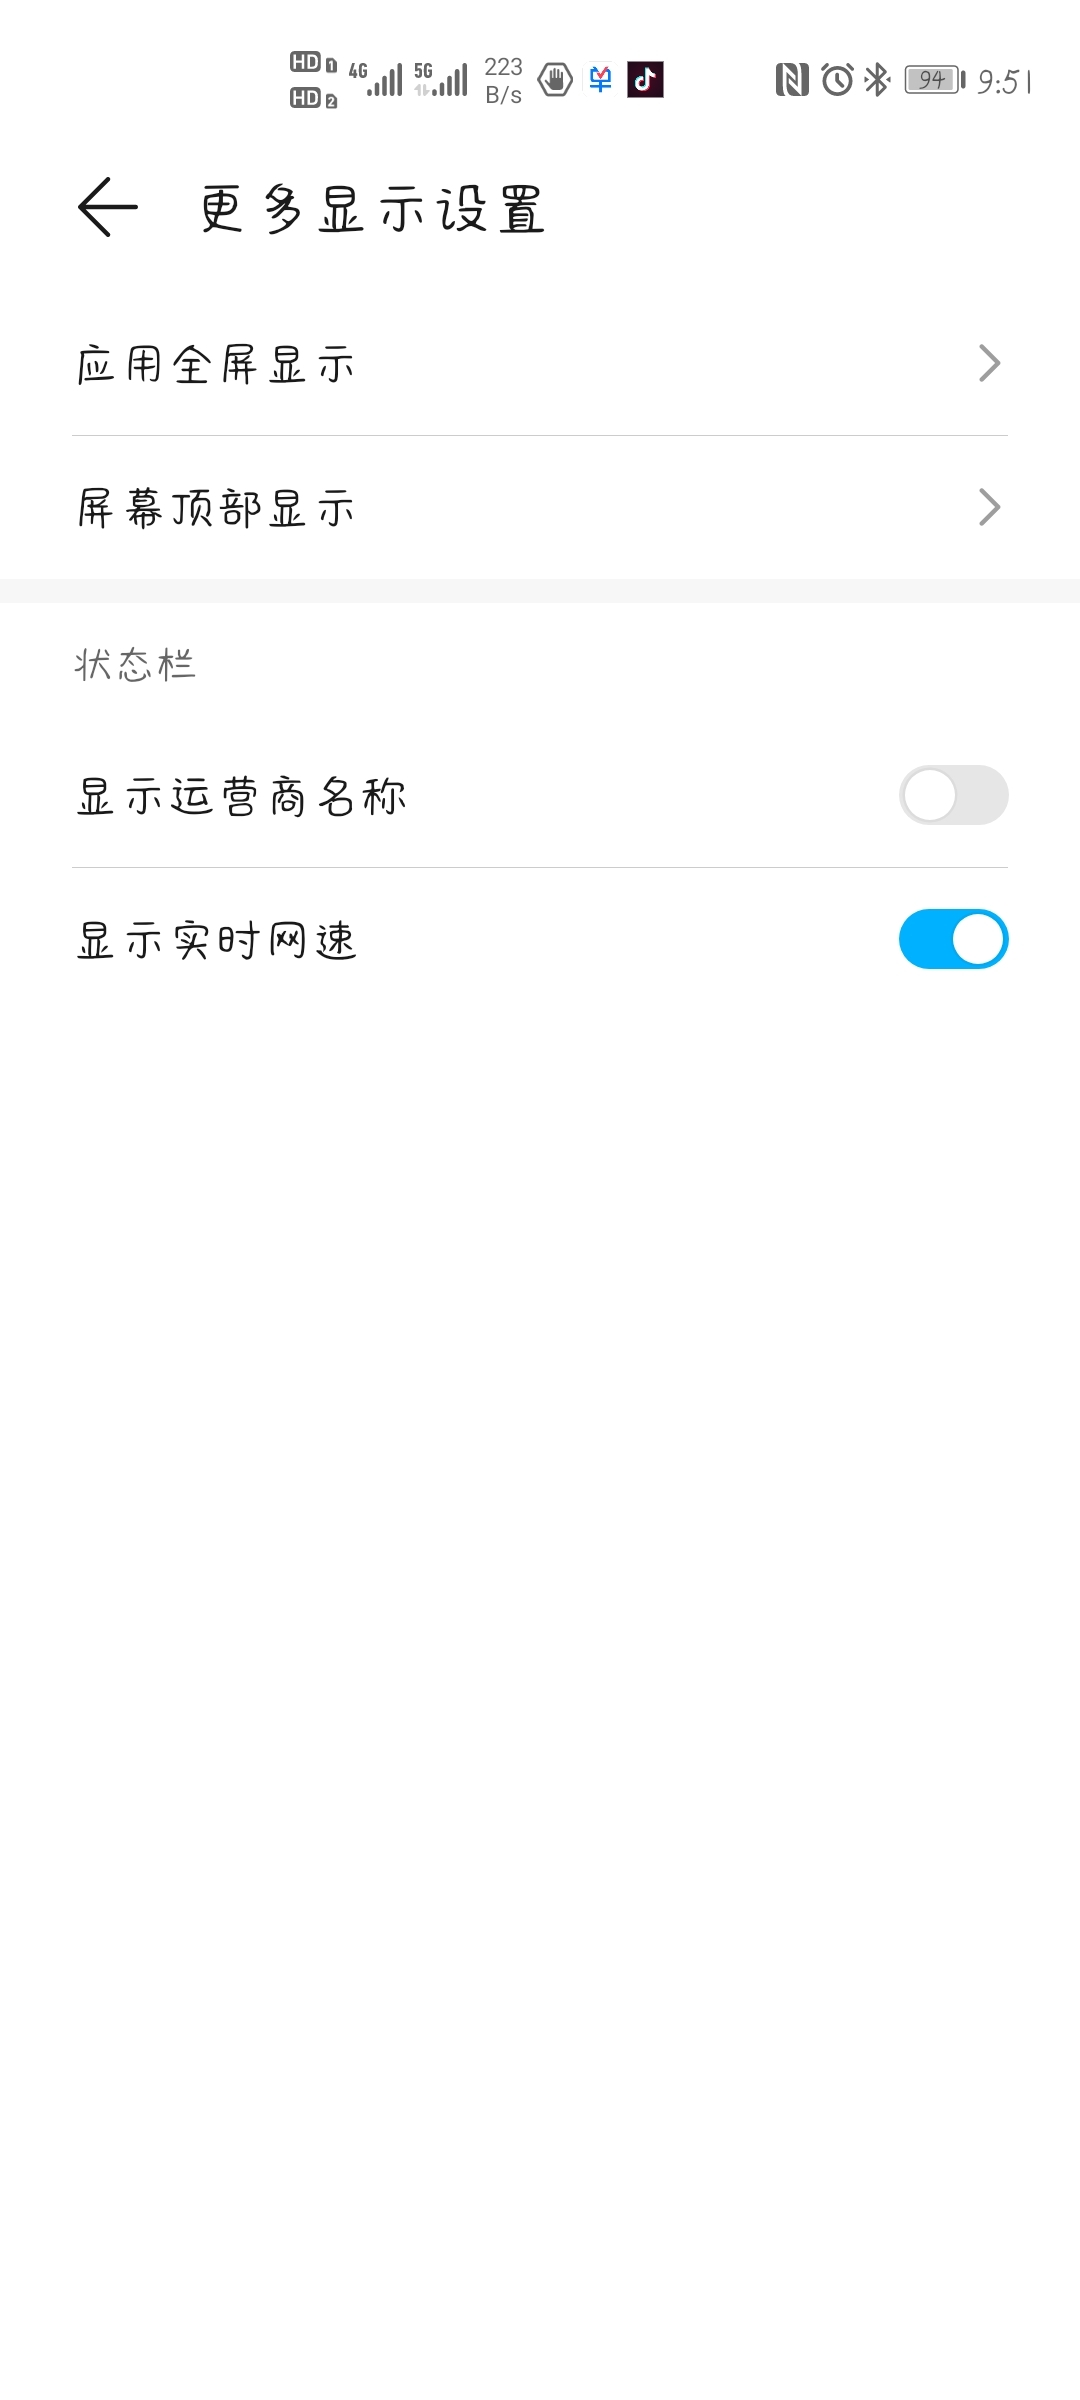 Screenshot_20201011_095158_com.android.settings.jpg